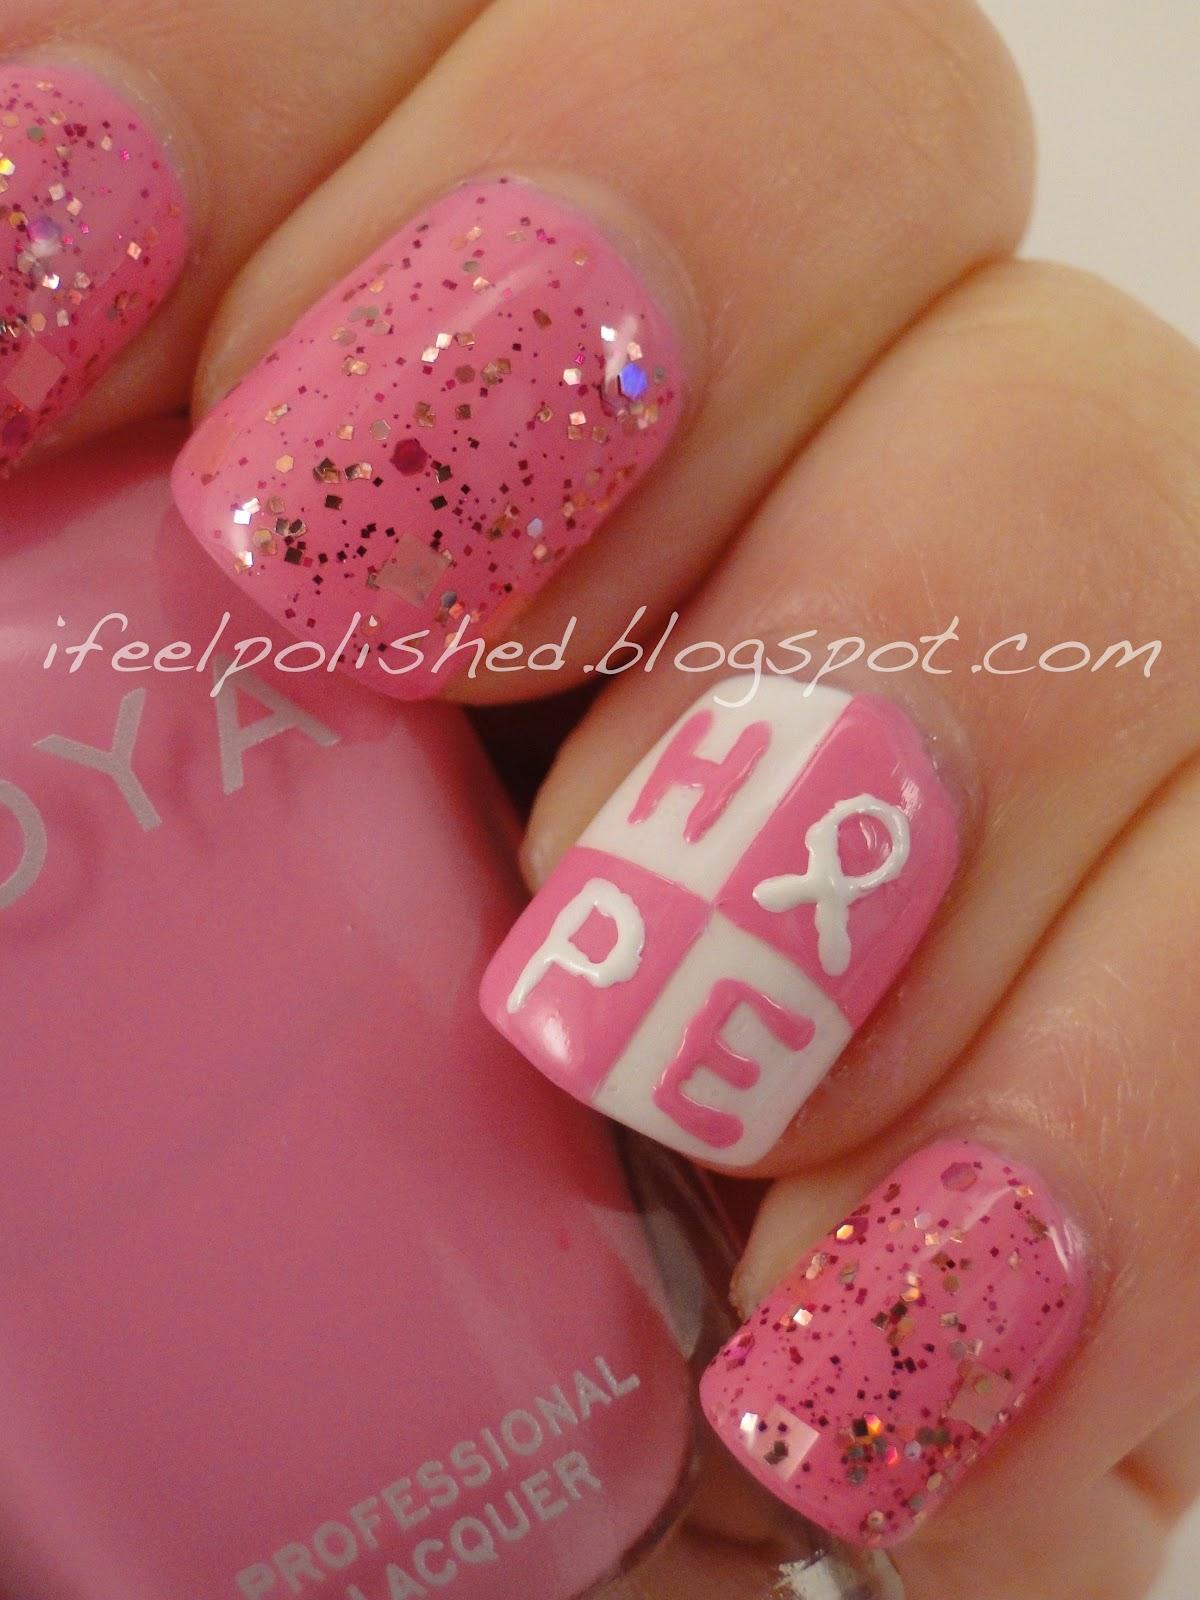 I Feel Polished!: Breast Cancer Awareness Nails: Take Two